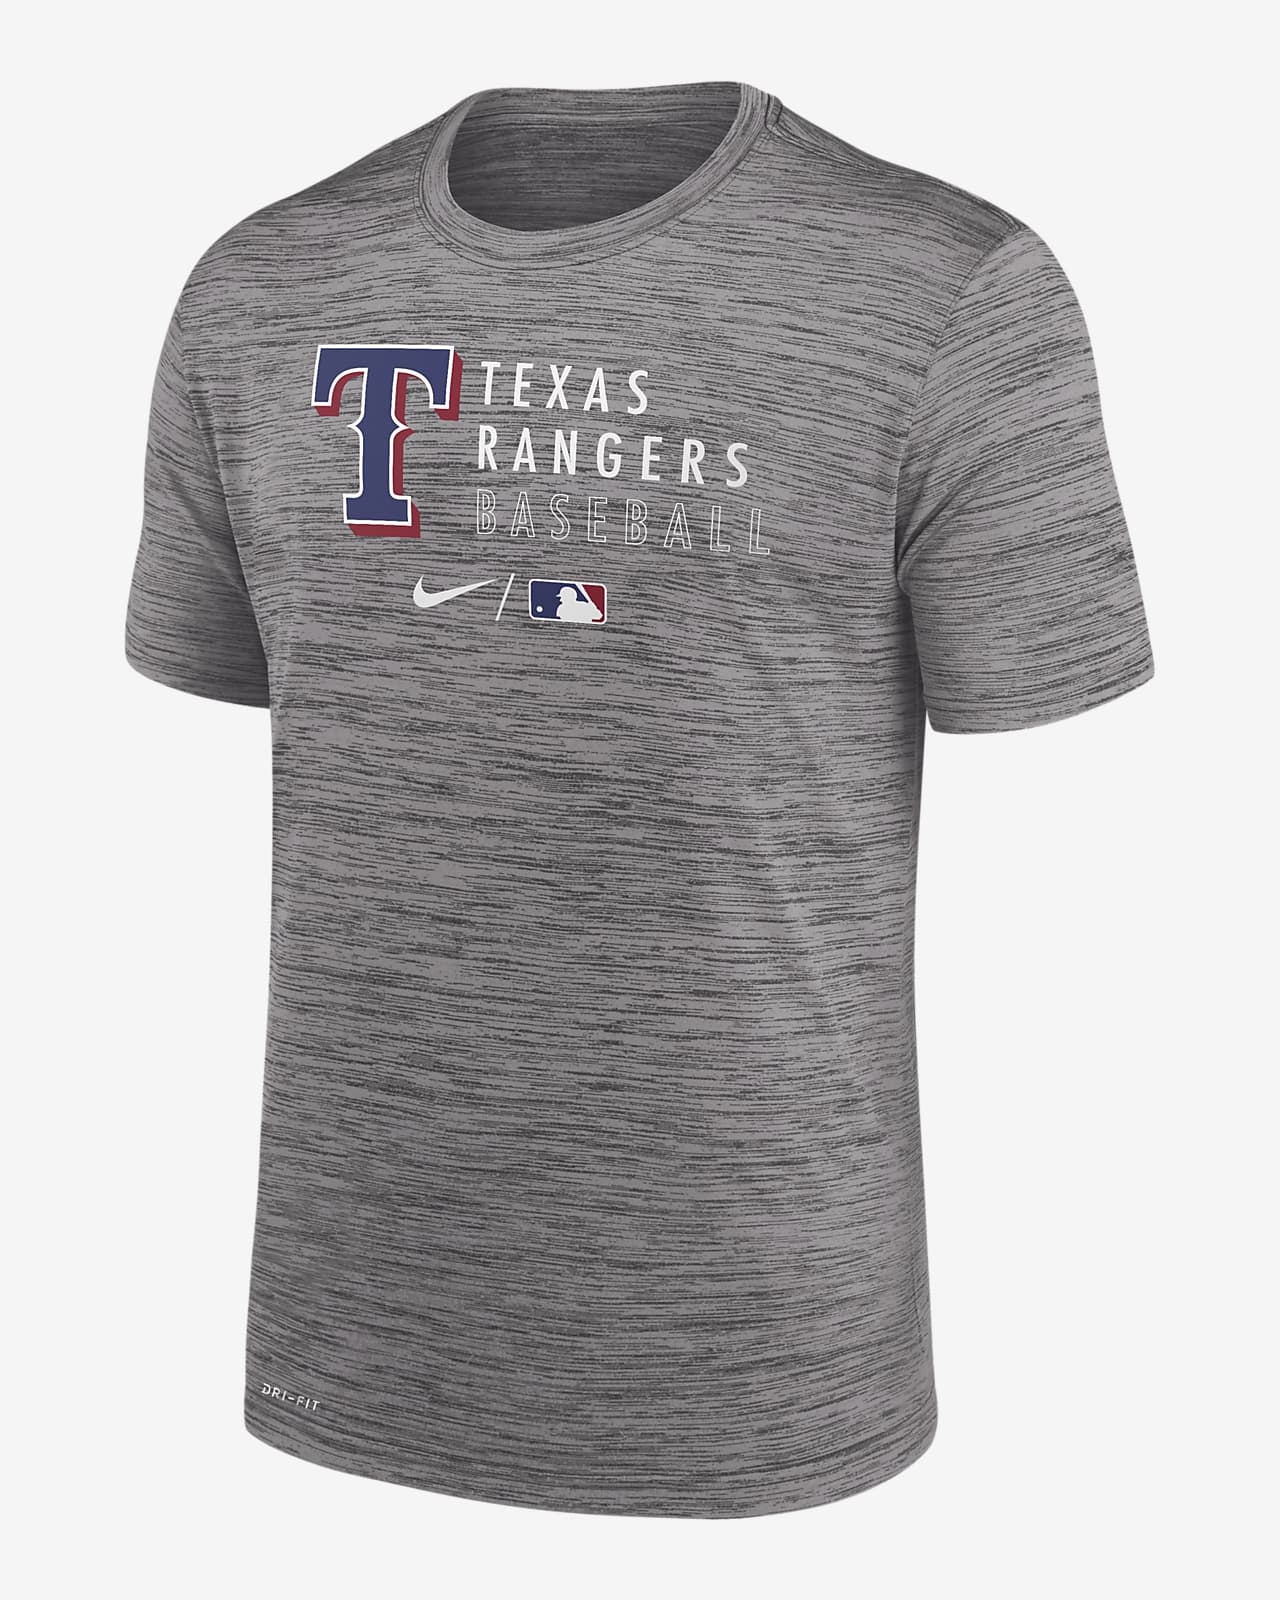 Nike Dri-FIT Velocity Practice (MLB Texas Rangers) Men's T-Shirt